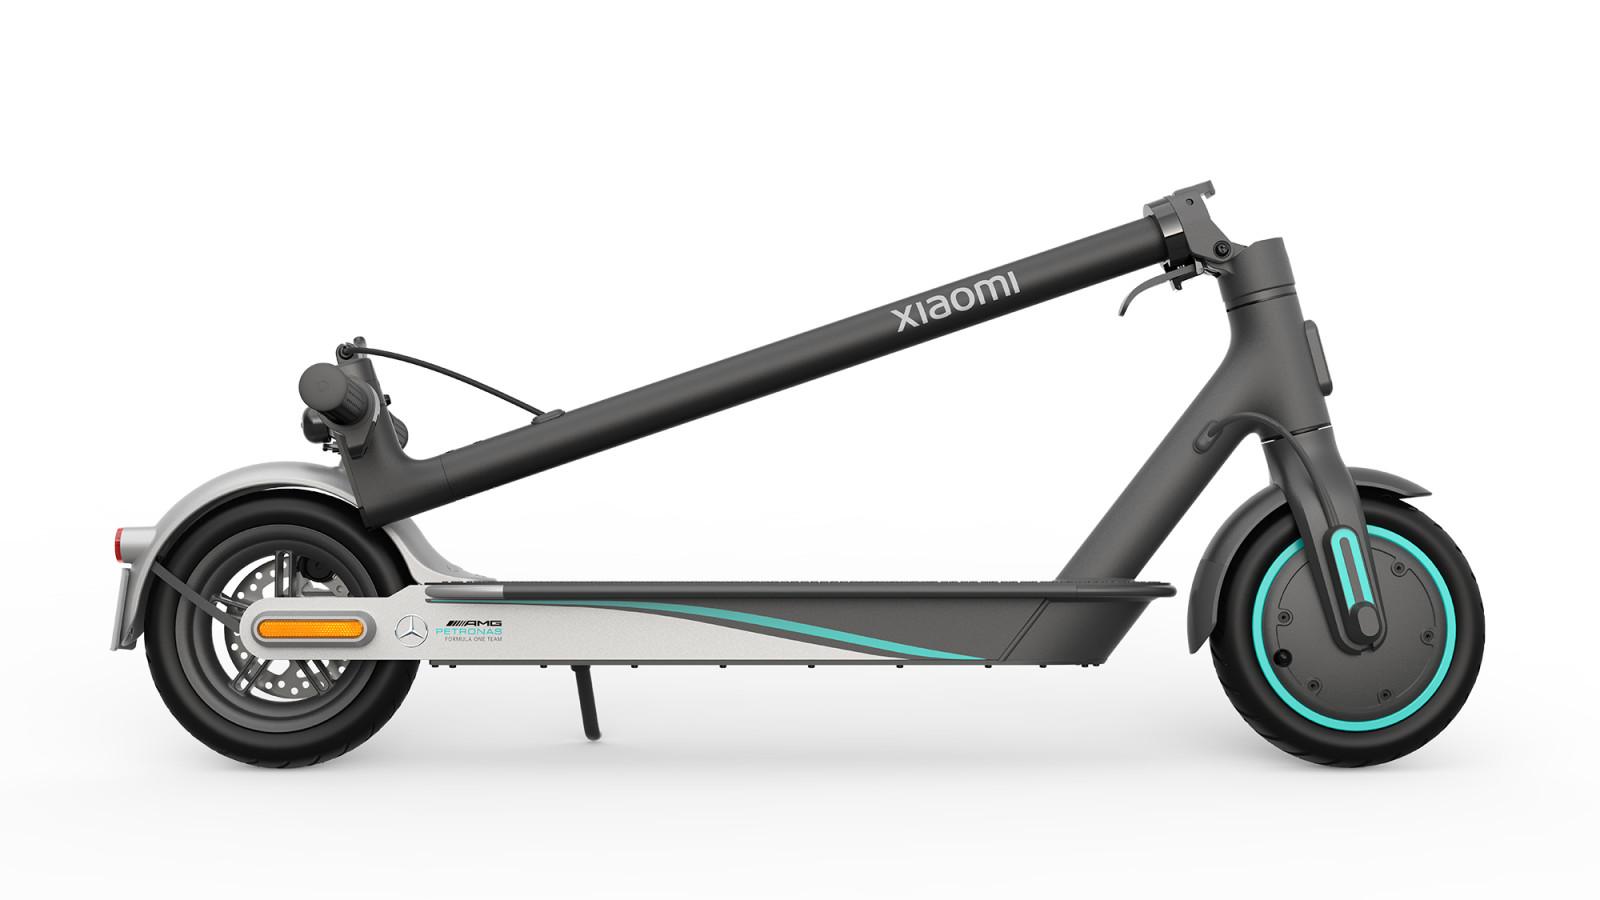 Xiaomi präsentiert einen neuen Formel-1-E-Scooter.